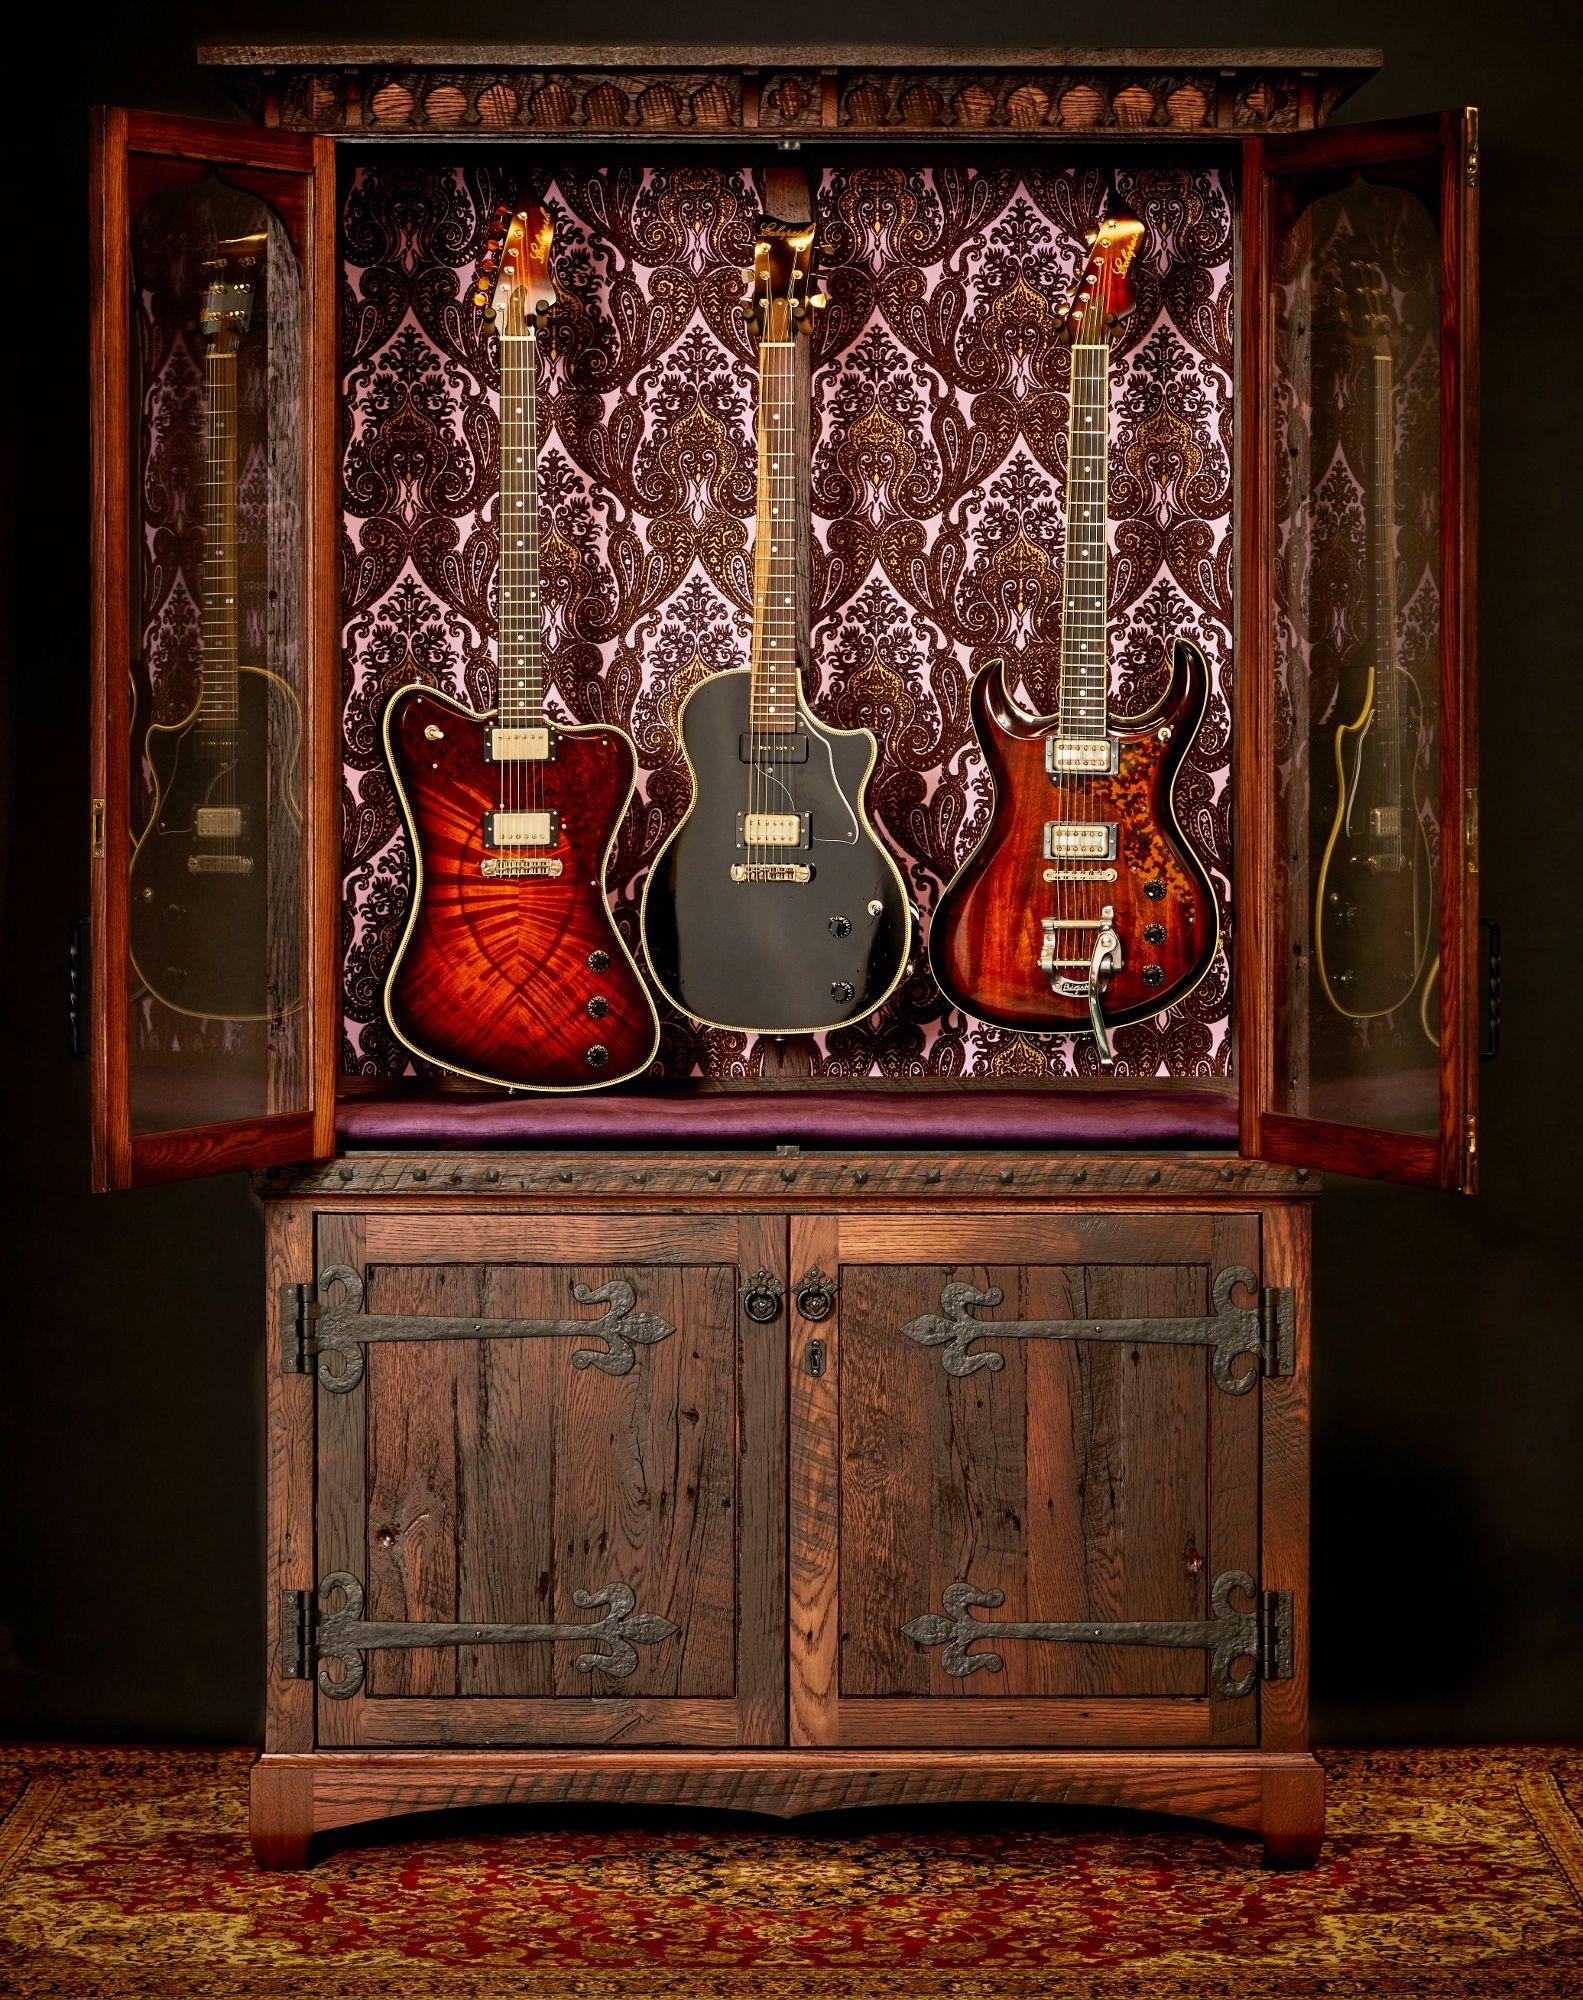 The Original Guitarmoire In Purple Velvet Featuring Echopark Guitars Guitar Display Storage And Humidification Fo Rangement Guitare Mobilier De Salon Guitare